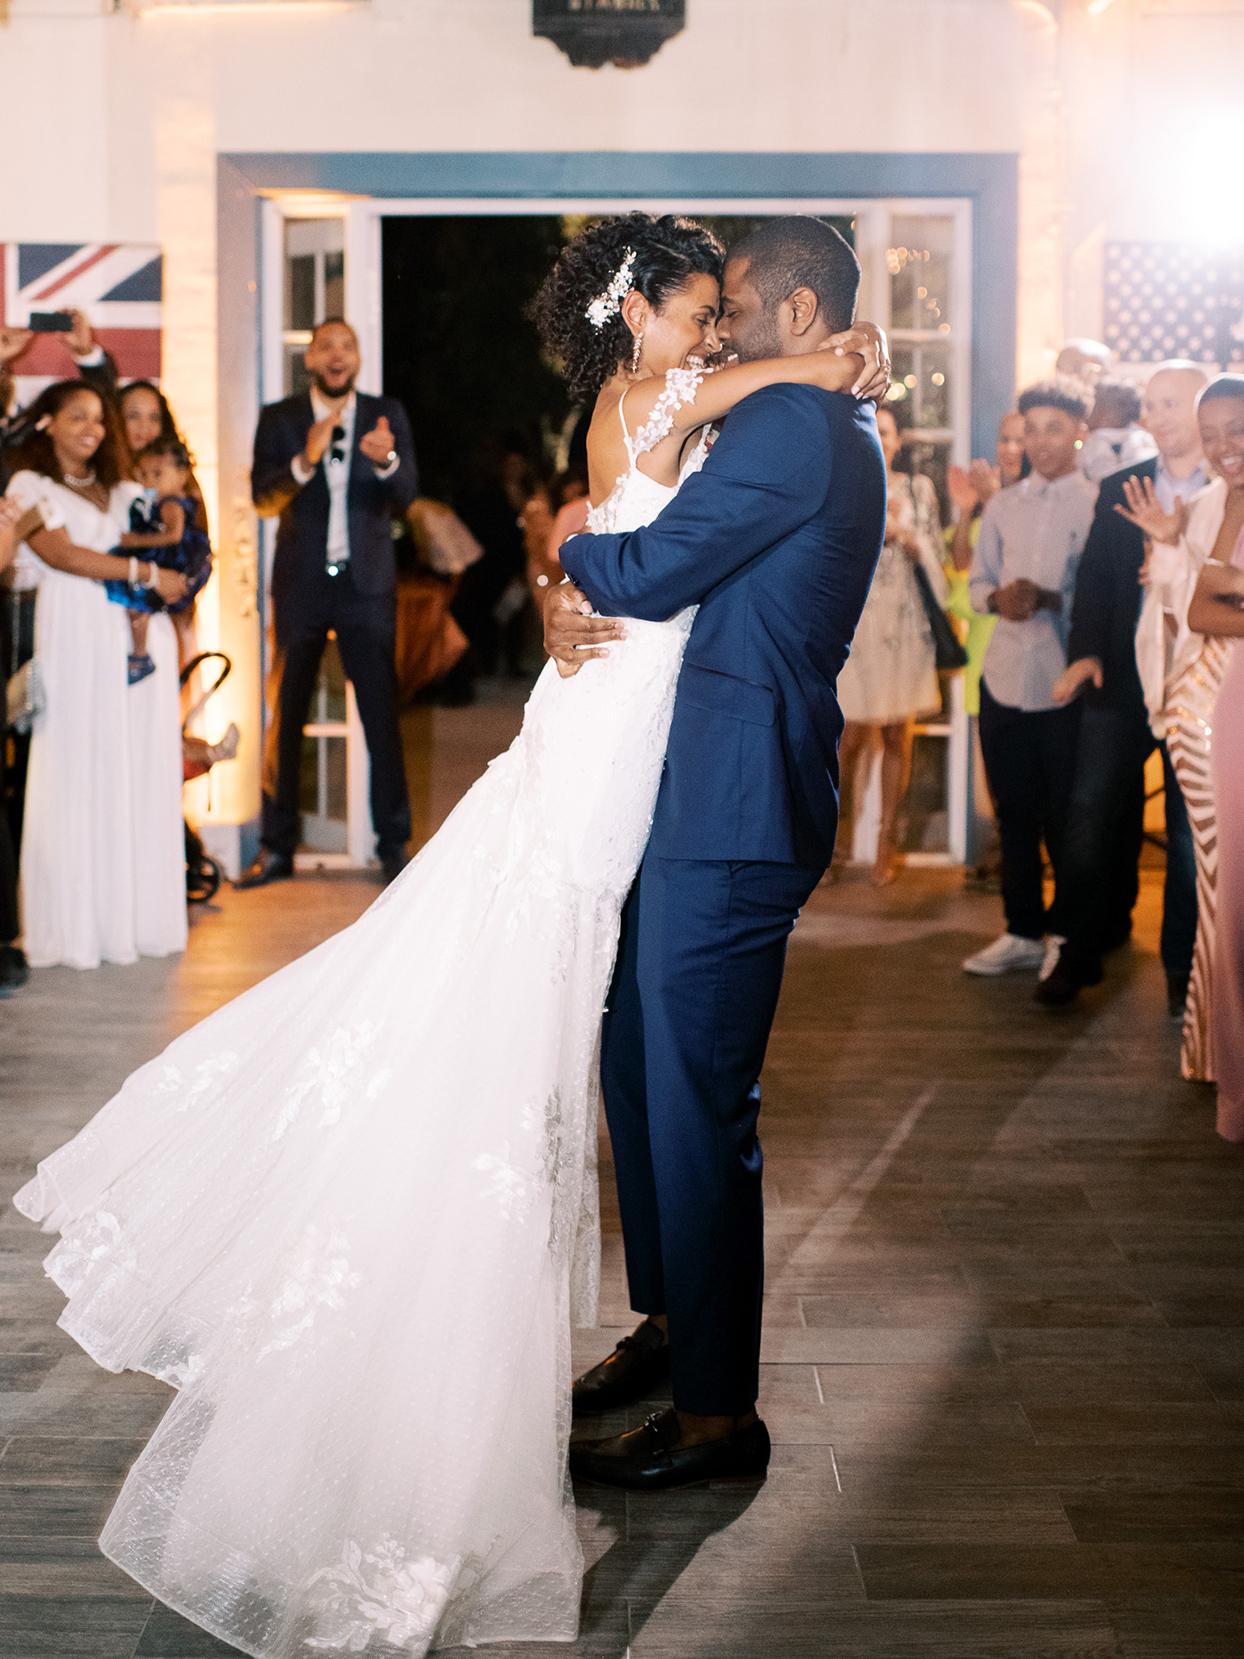 melissa lindsey wedding couple first dance lift